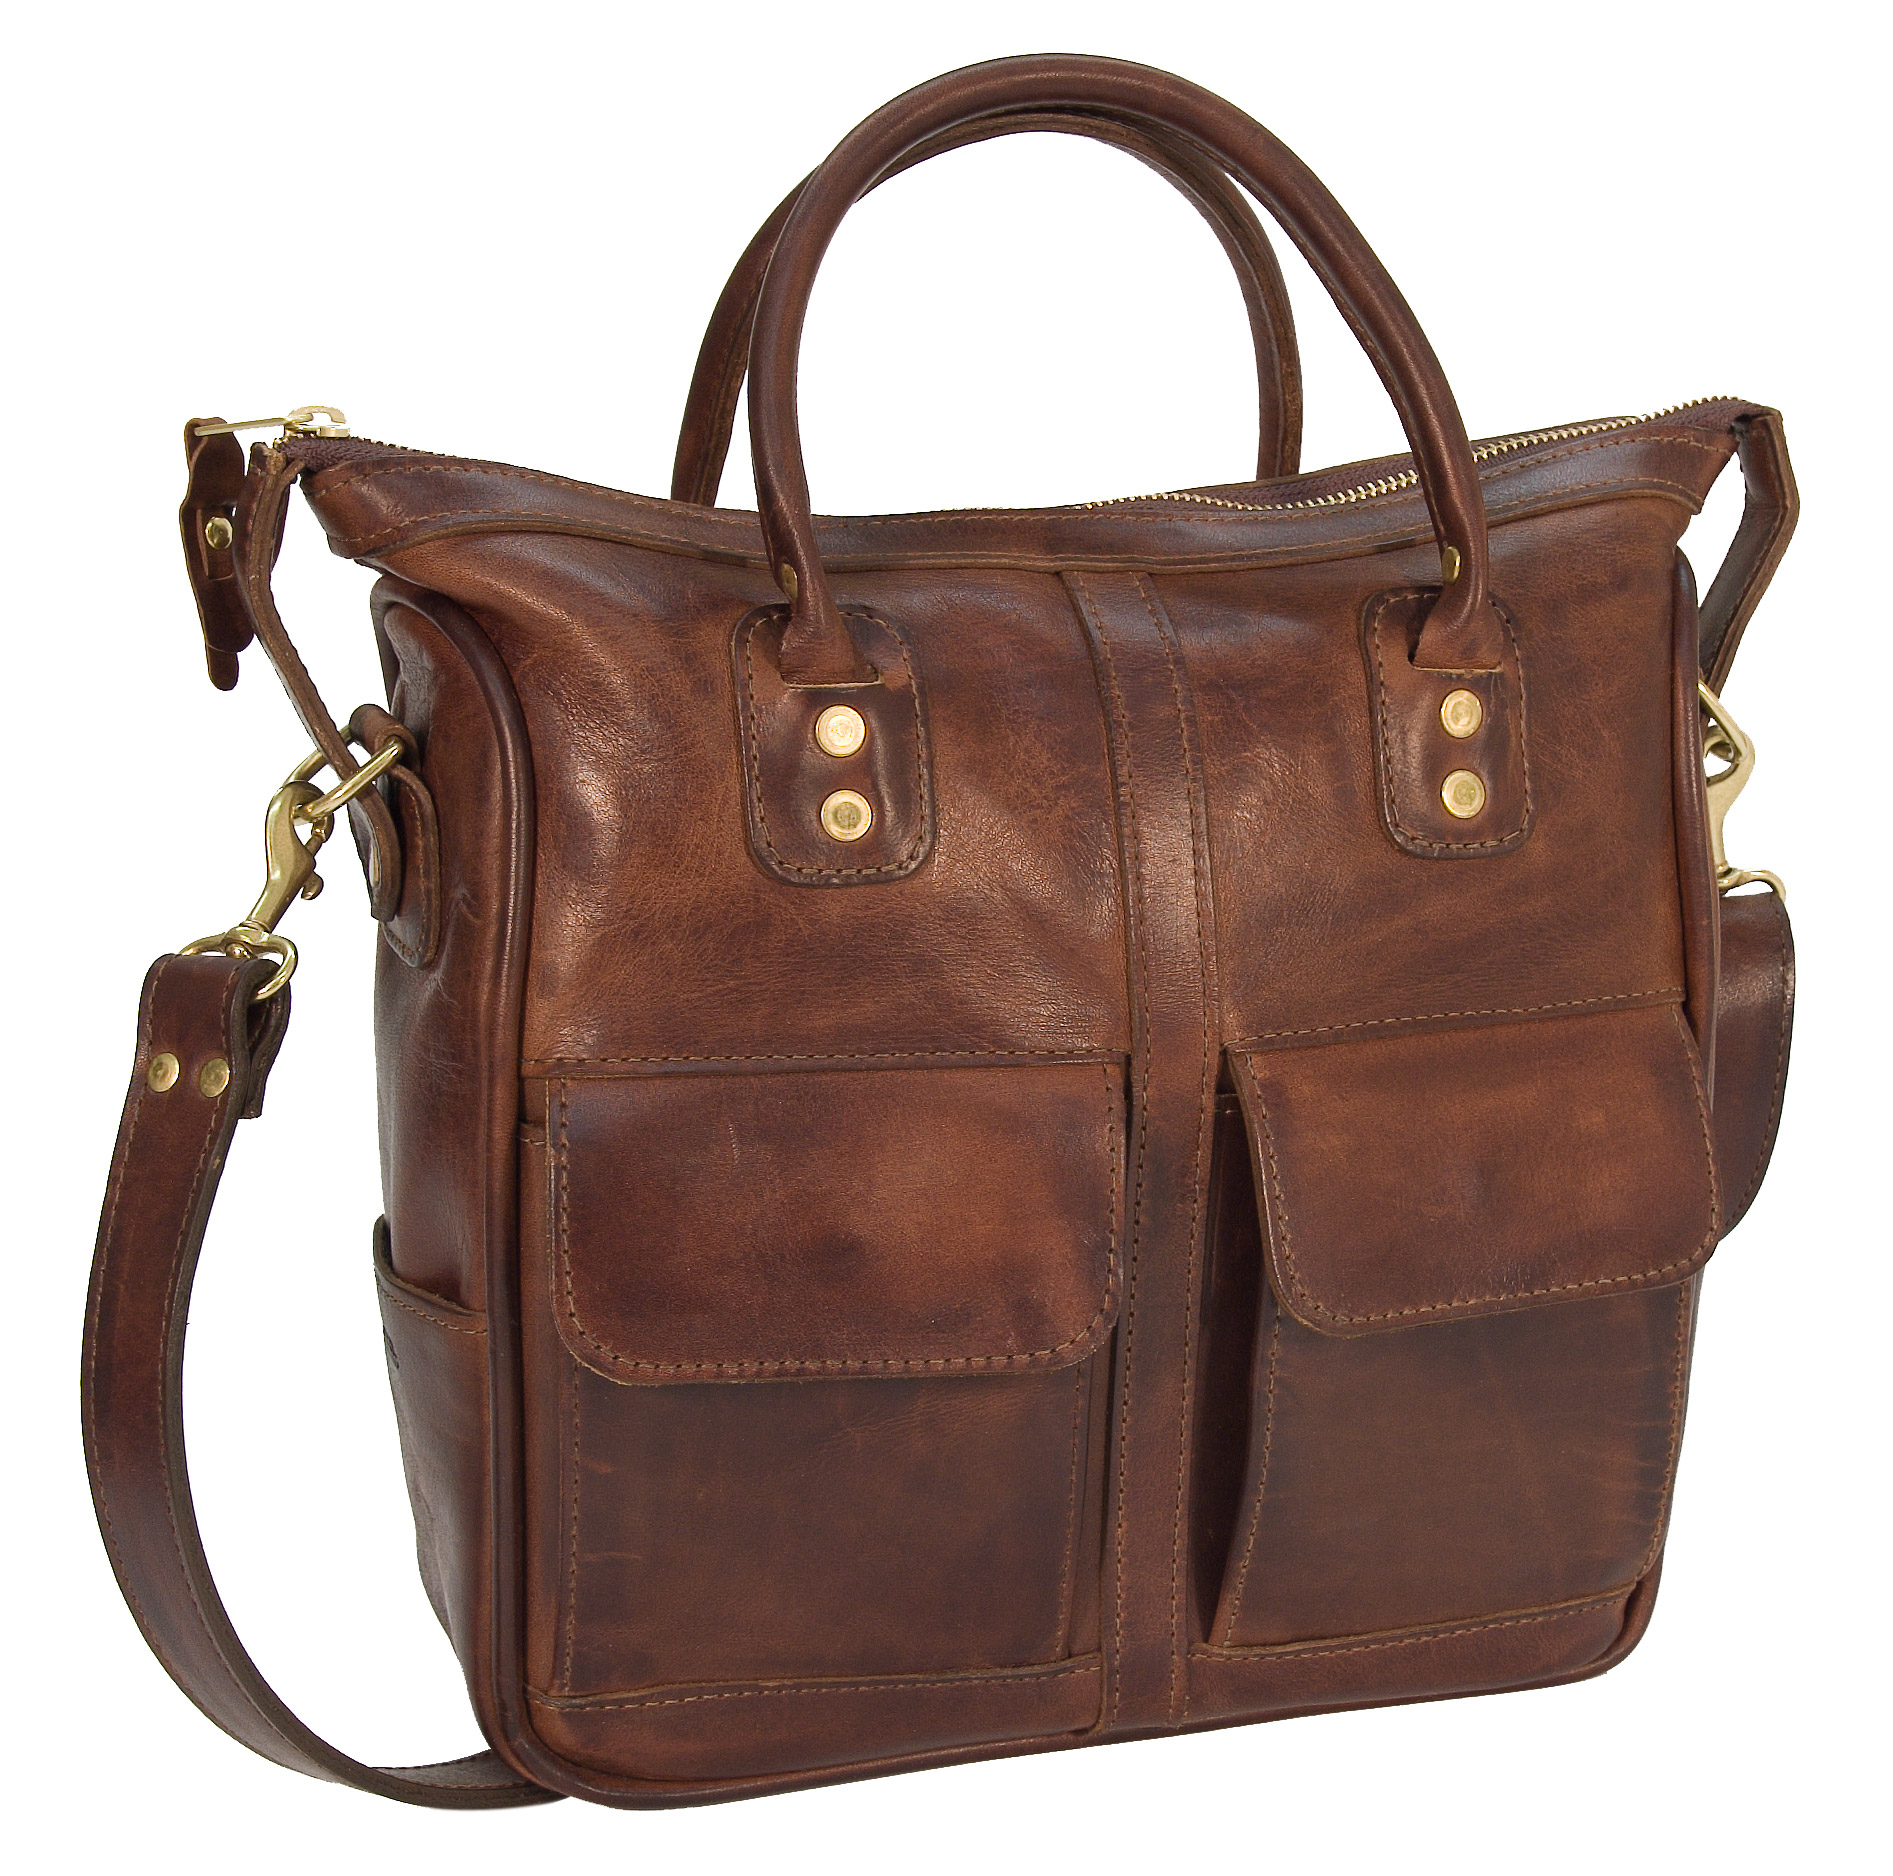 Distressed leather handbag with detachable shoulder strap